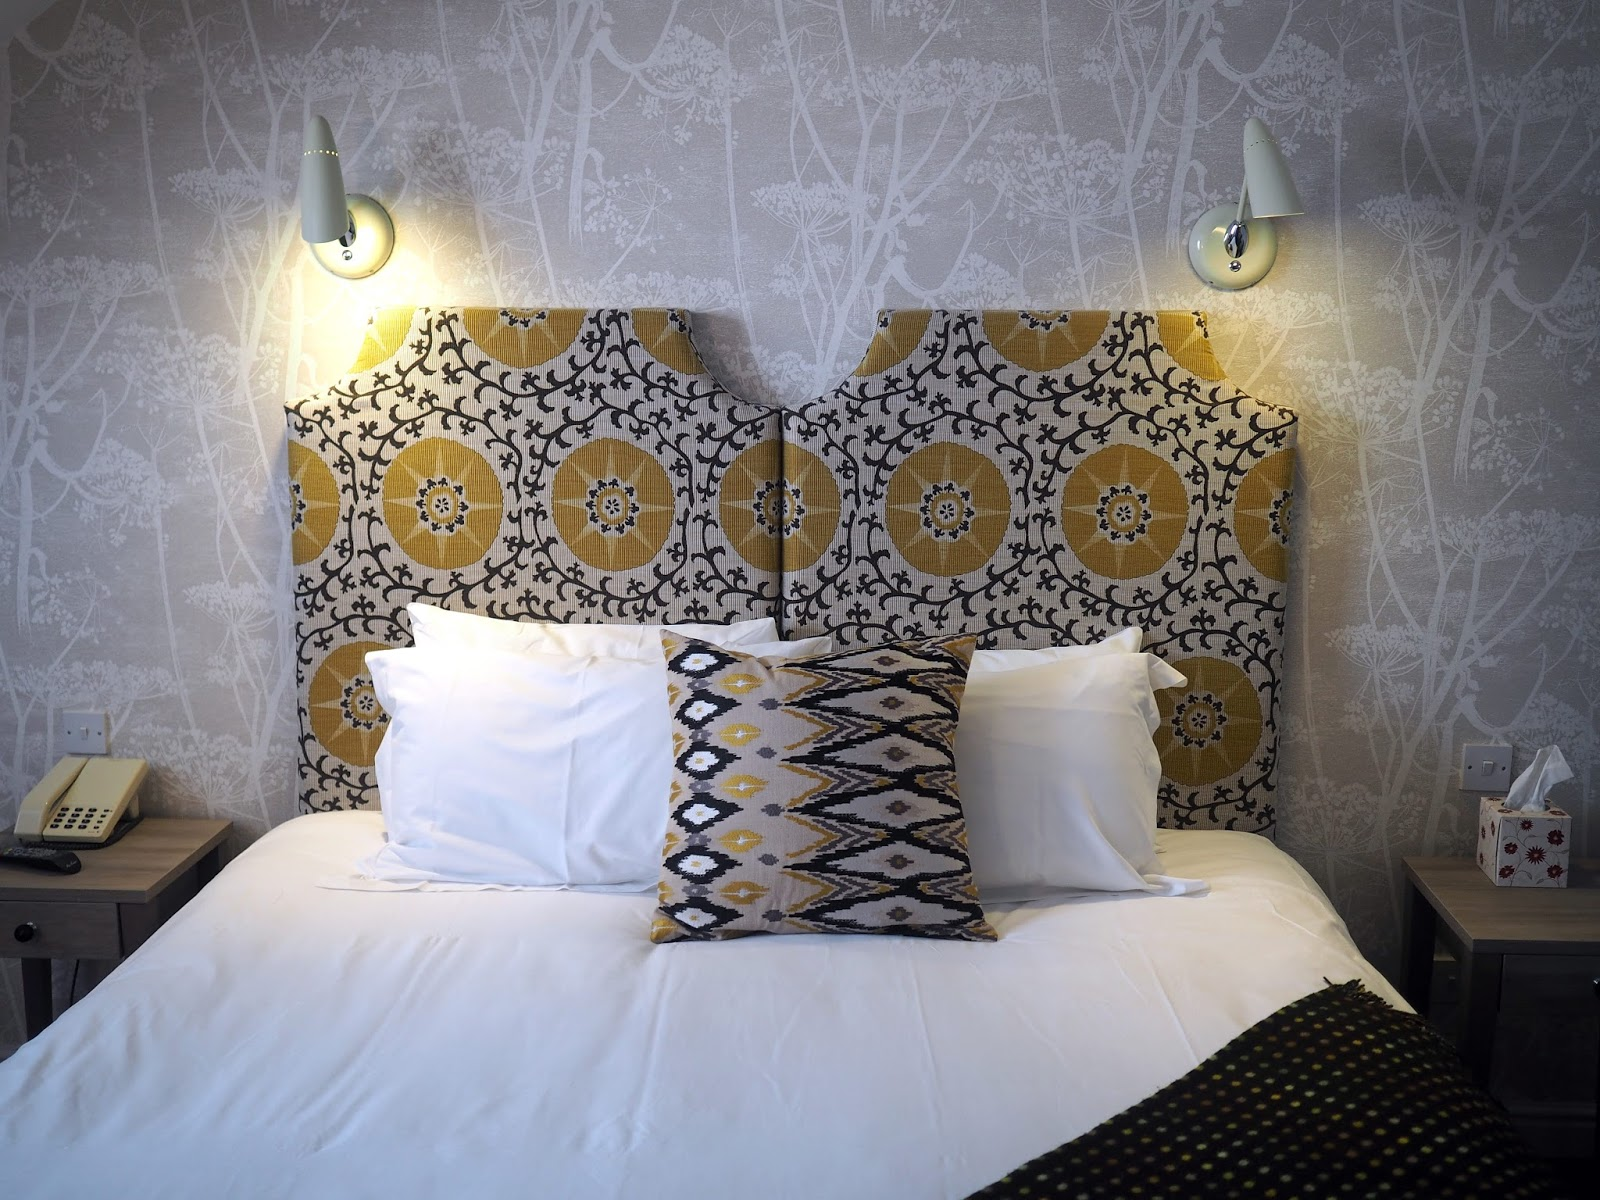 Hotel suite bedroom at Monk Bar York hotel